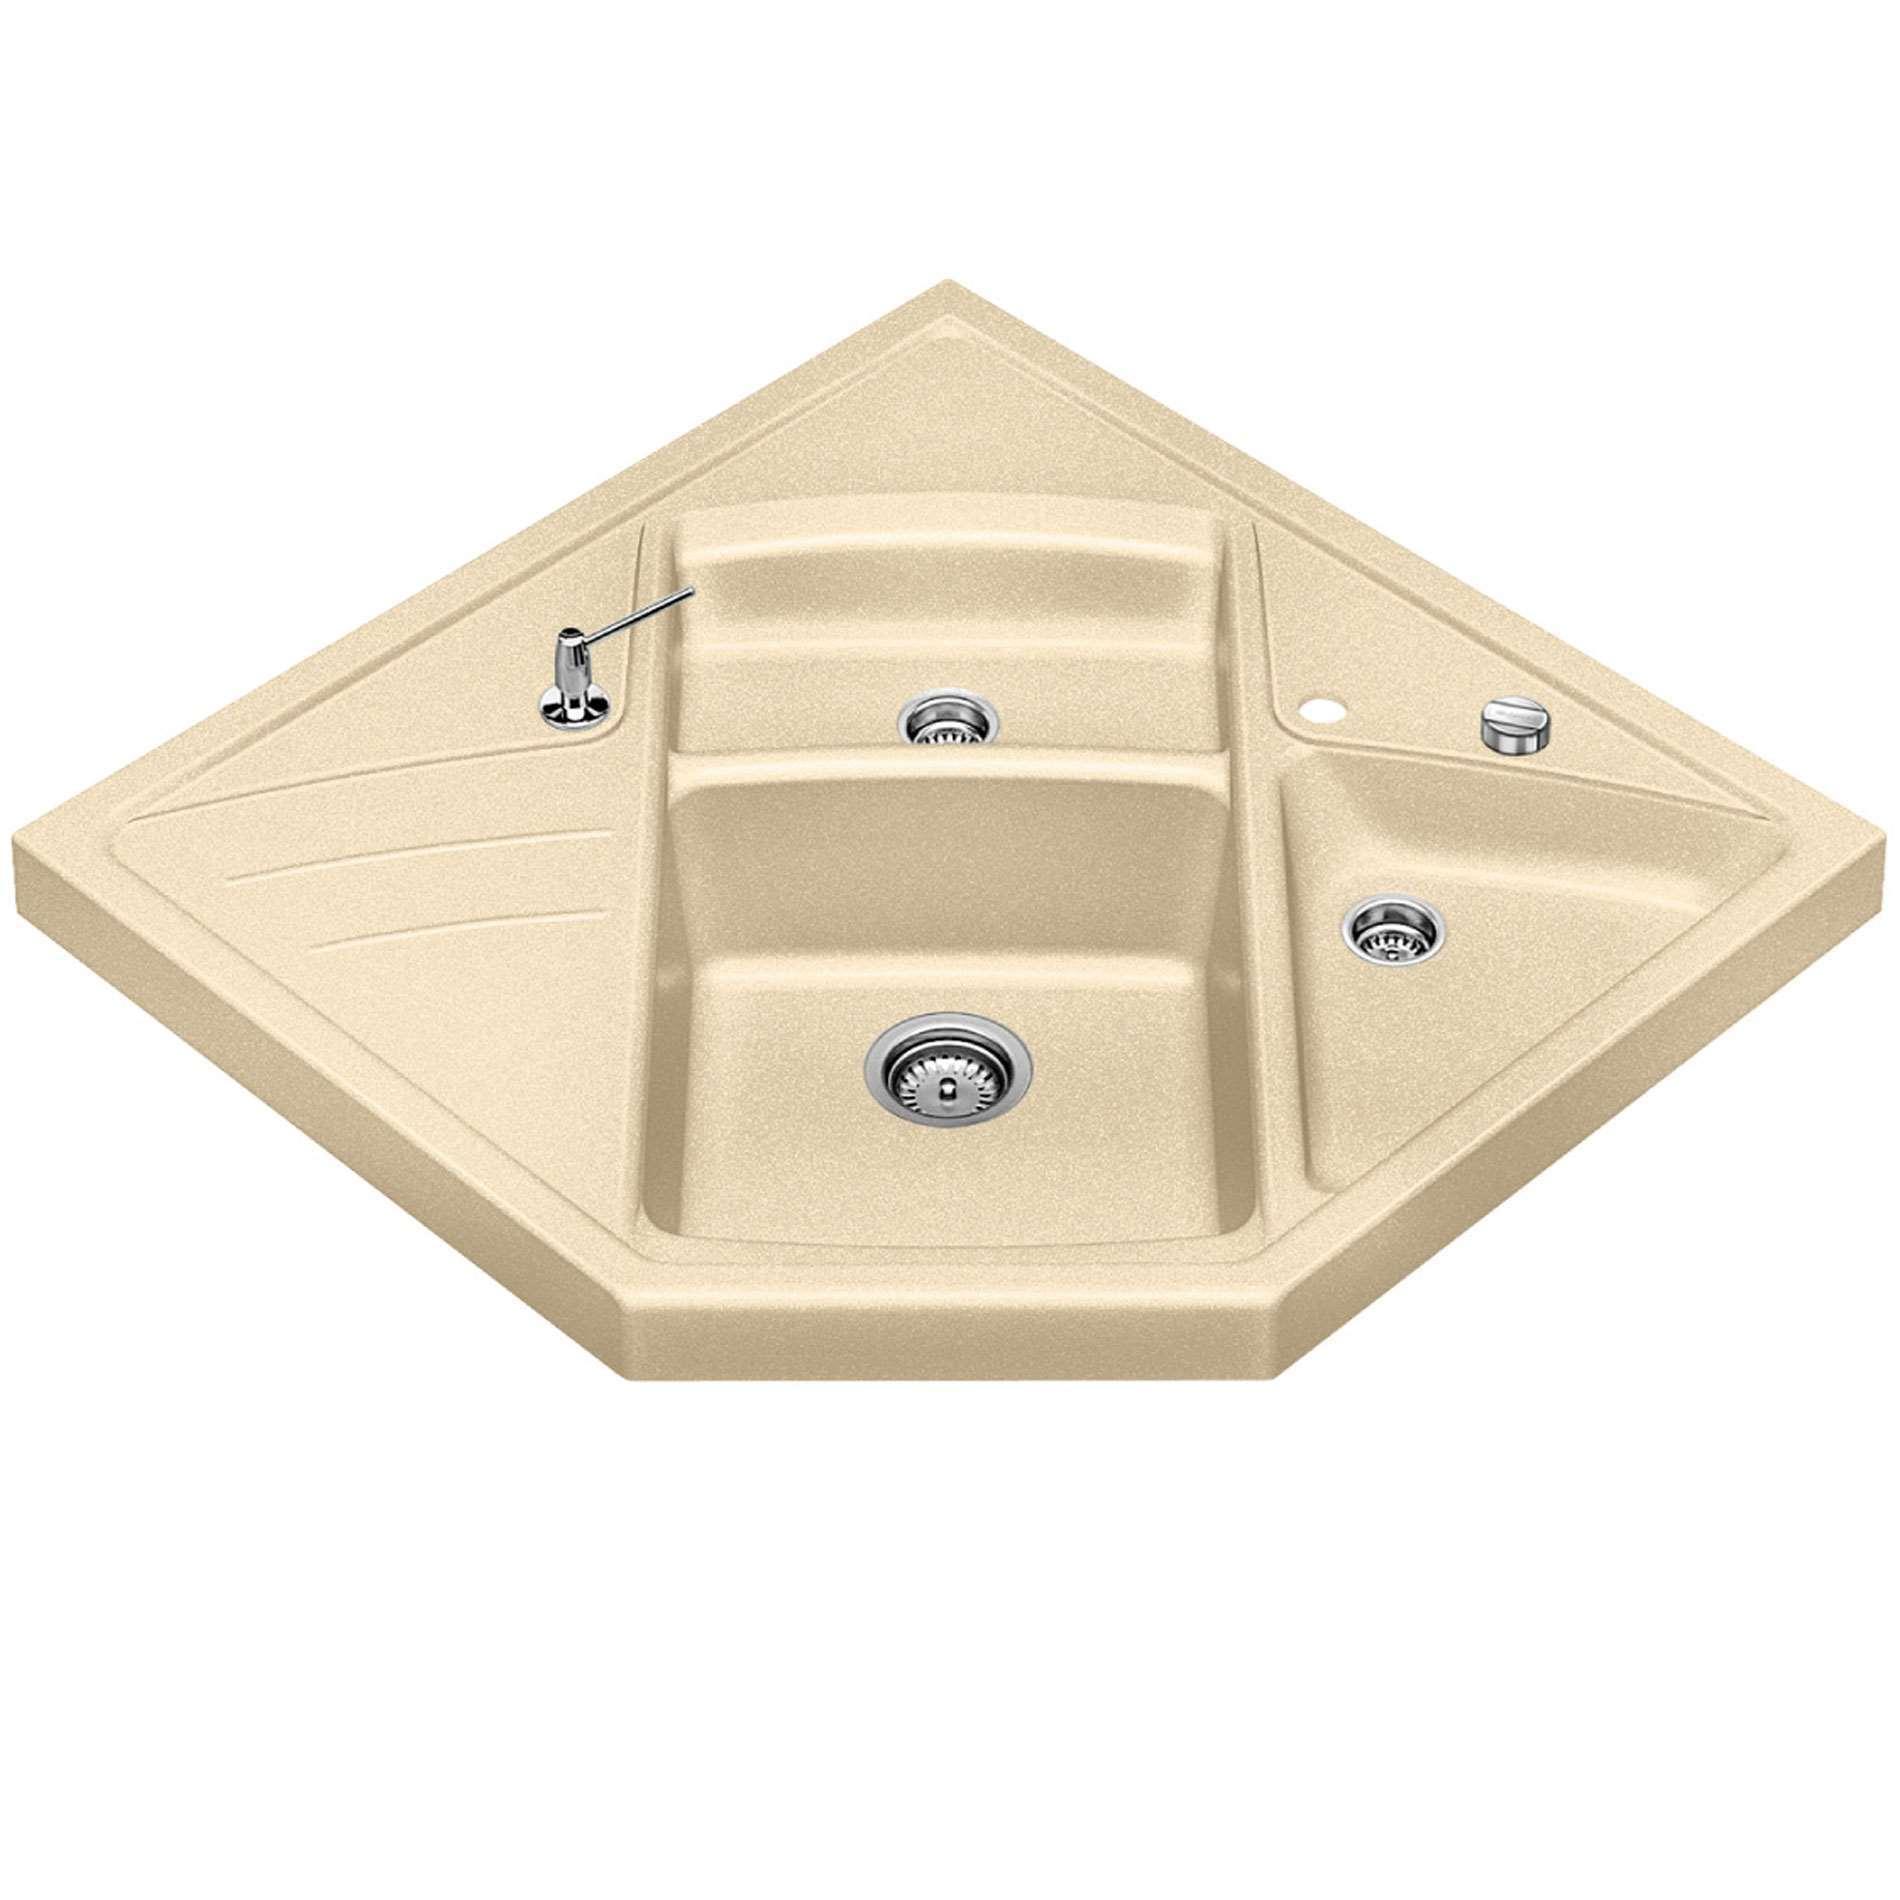 Corner kitchen sinks uk space saver double bowl kitchen for Silgranit bathroom sinks